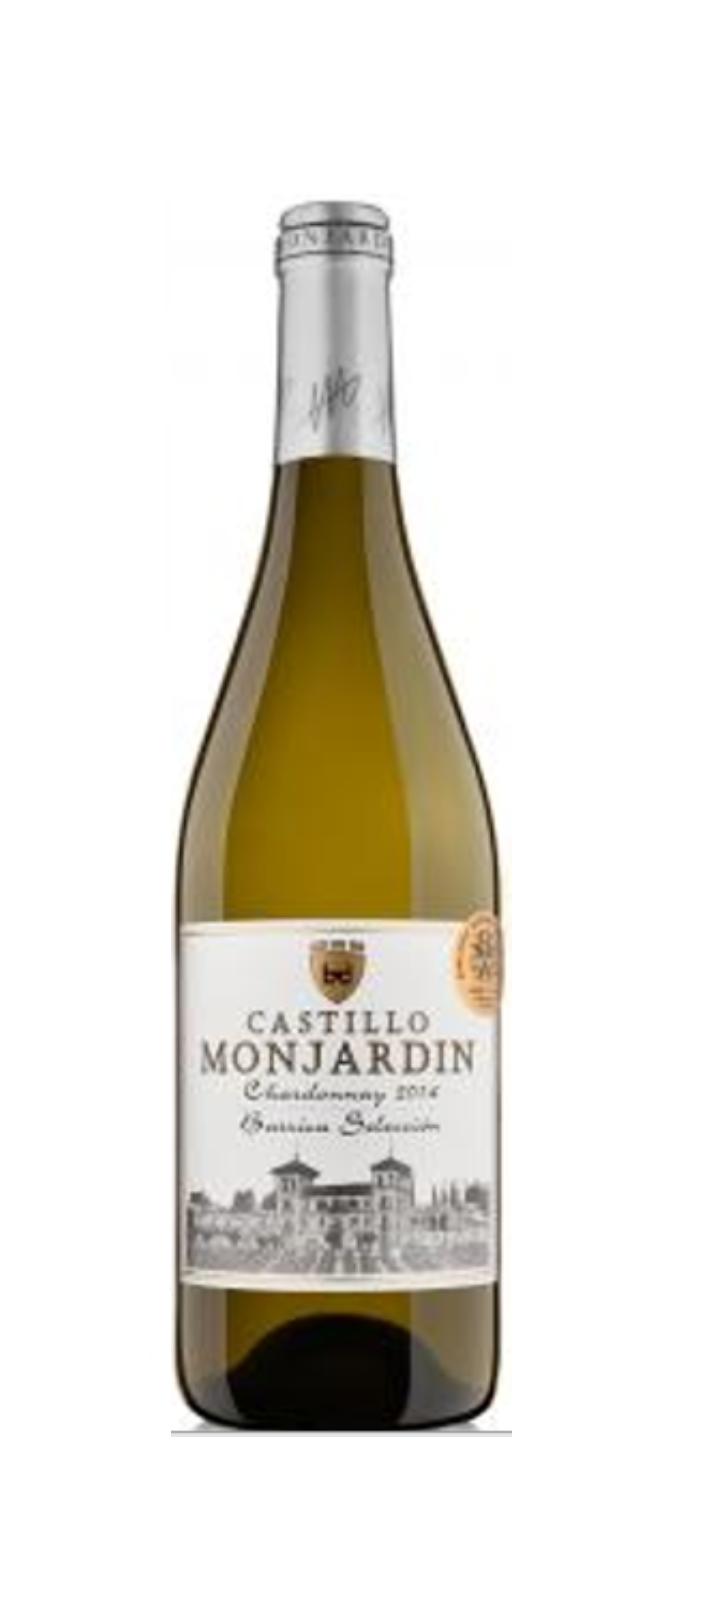 CASTILLO Monjardin Chardonnay barrica 2016 - BLANC